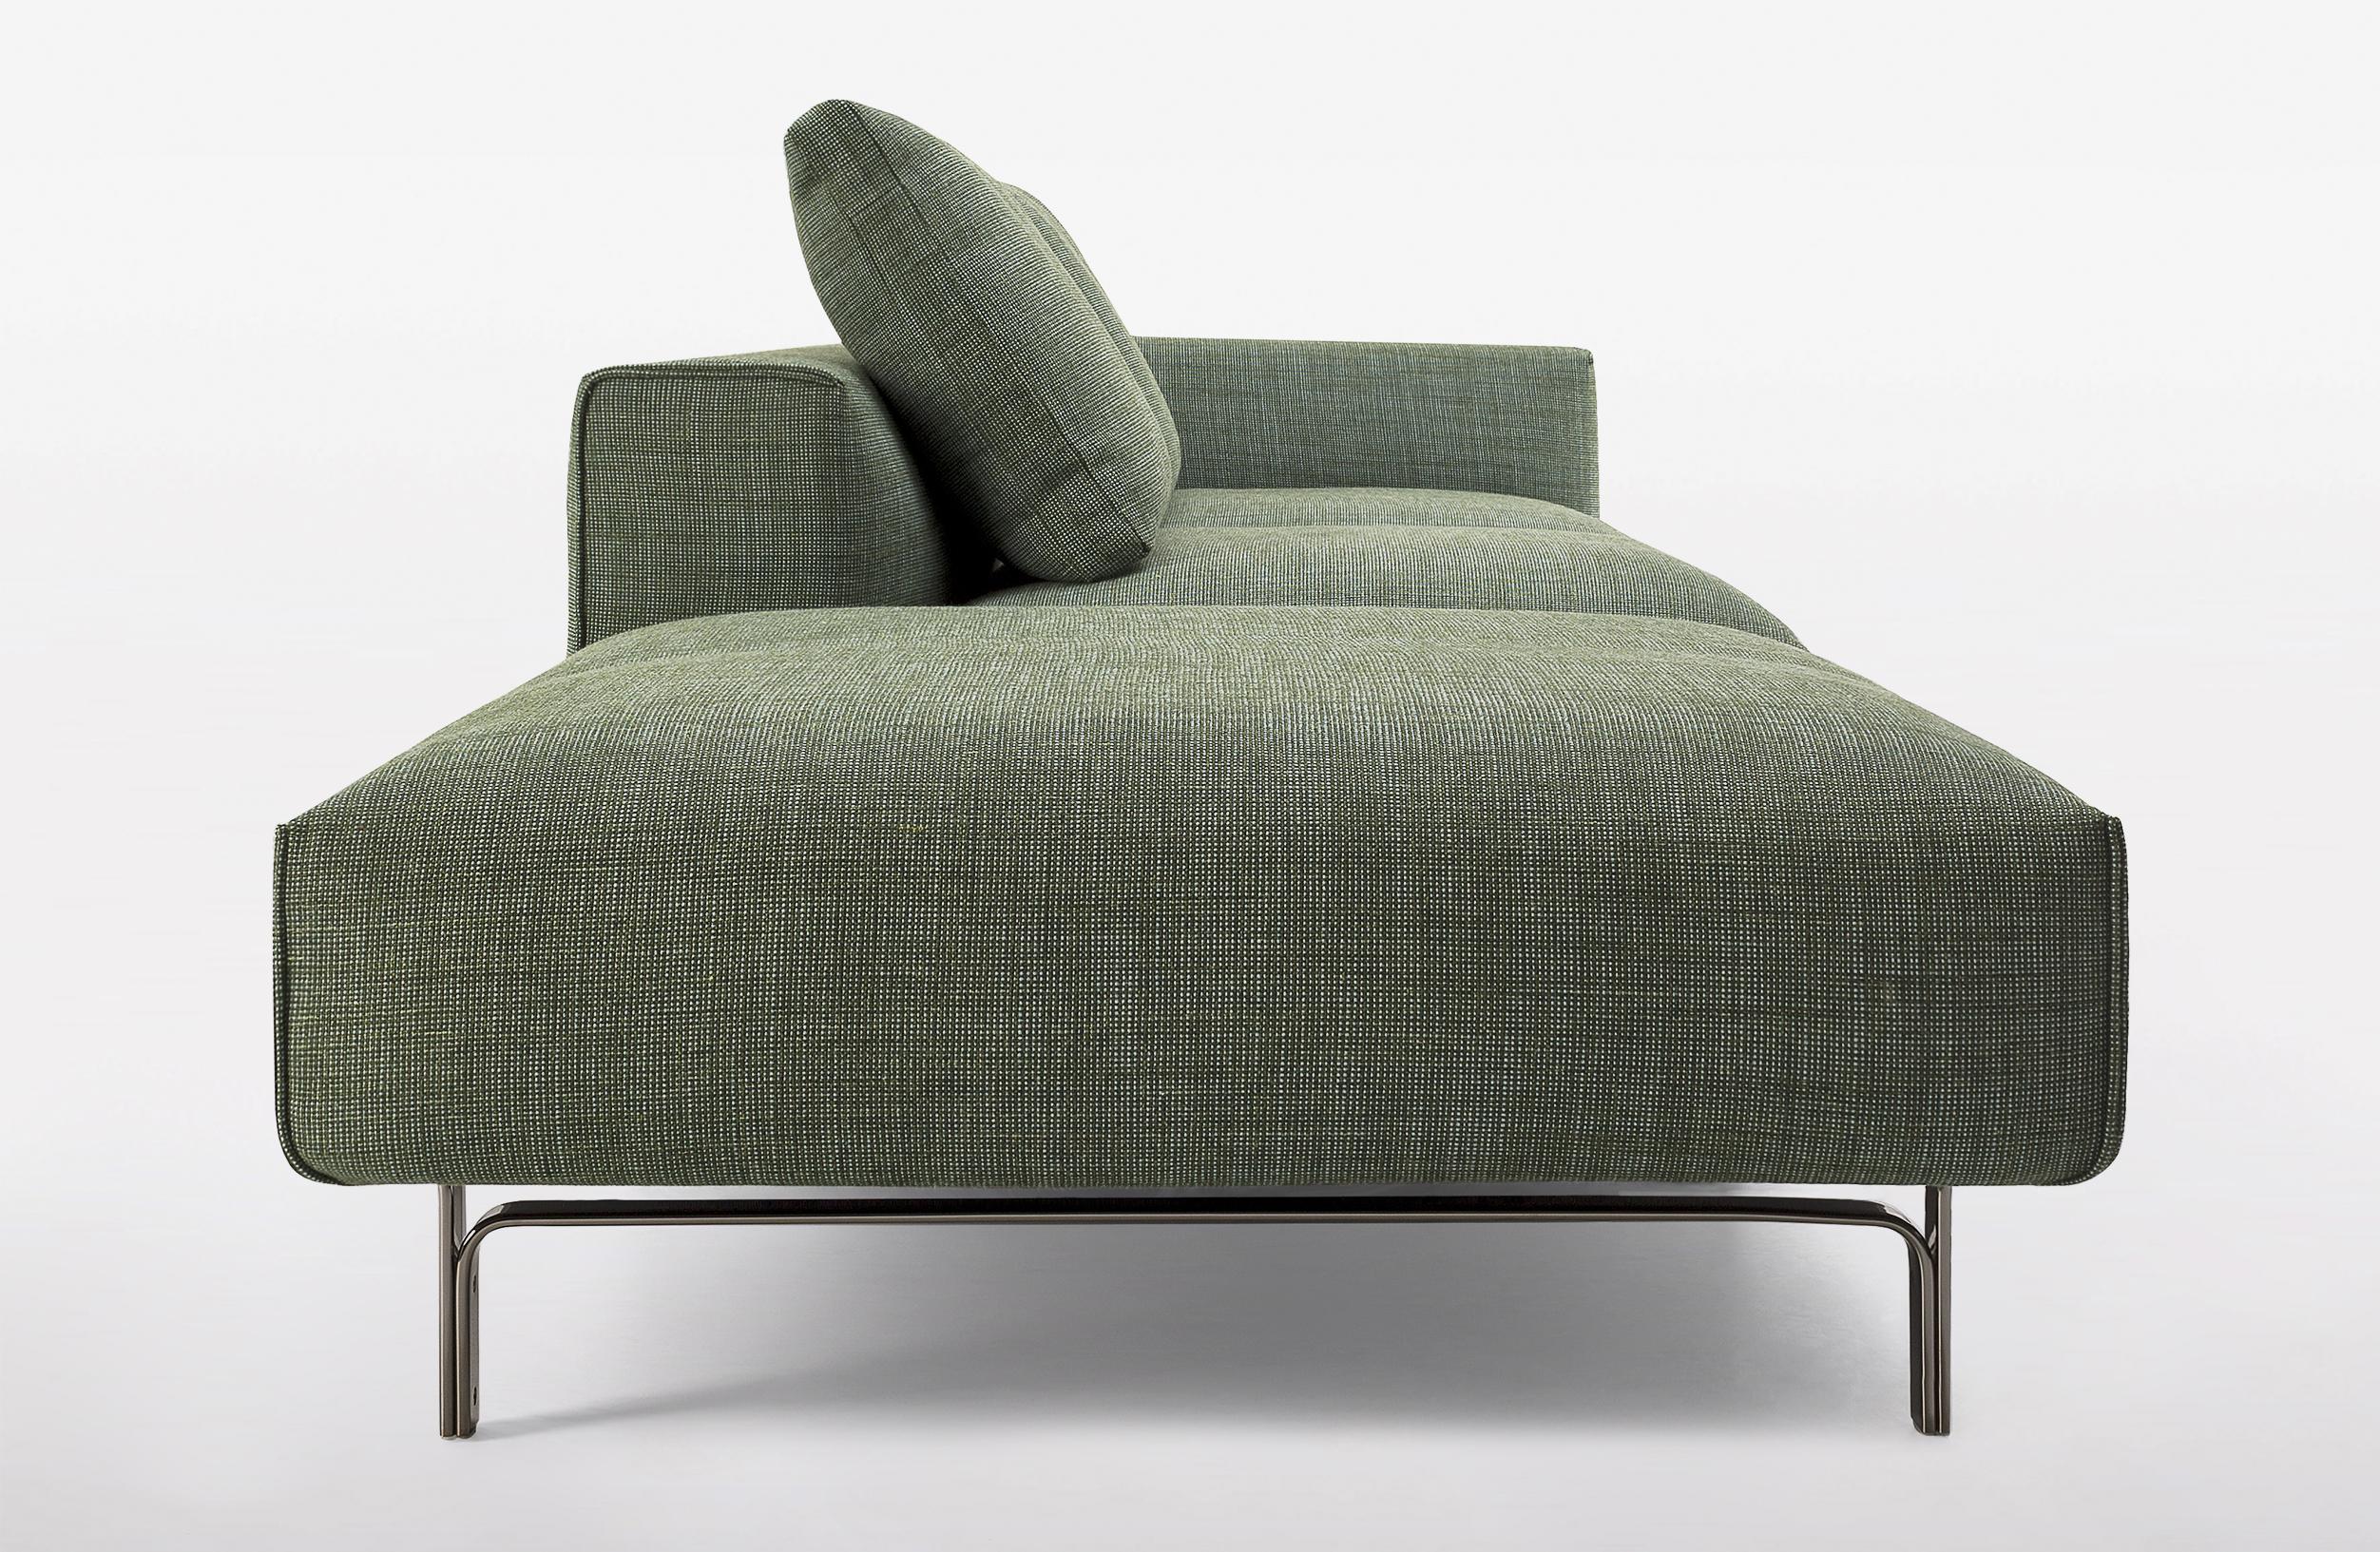 busnelli-todd-modular sofa-03